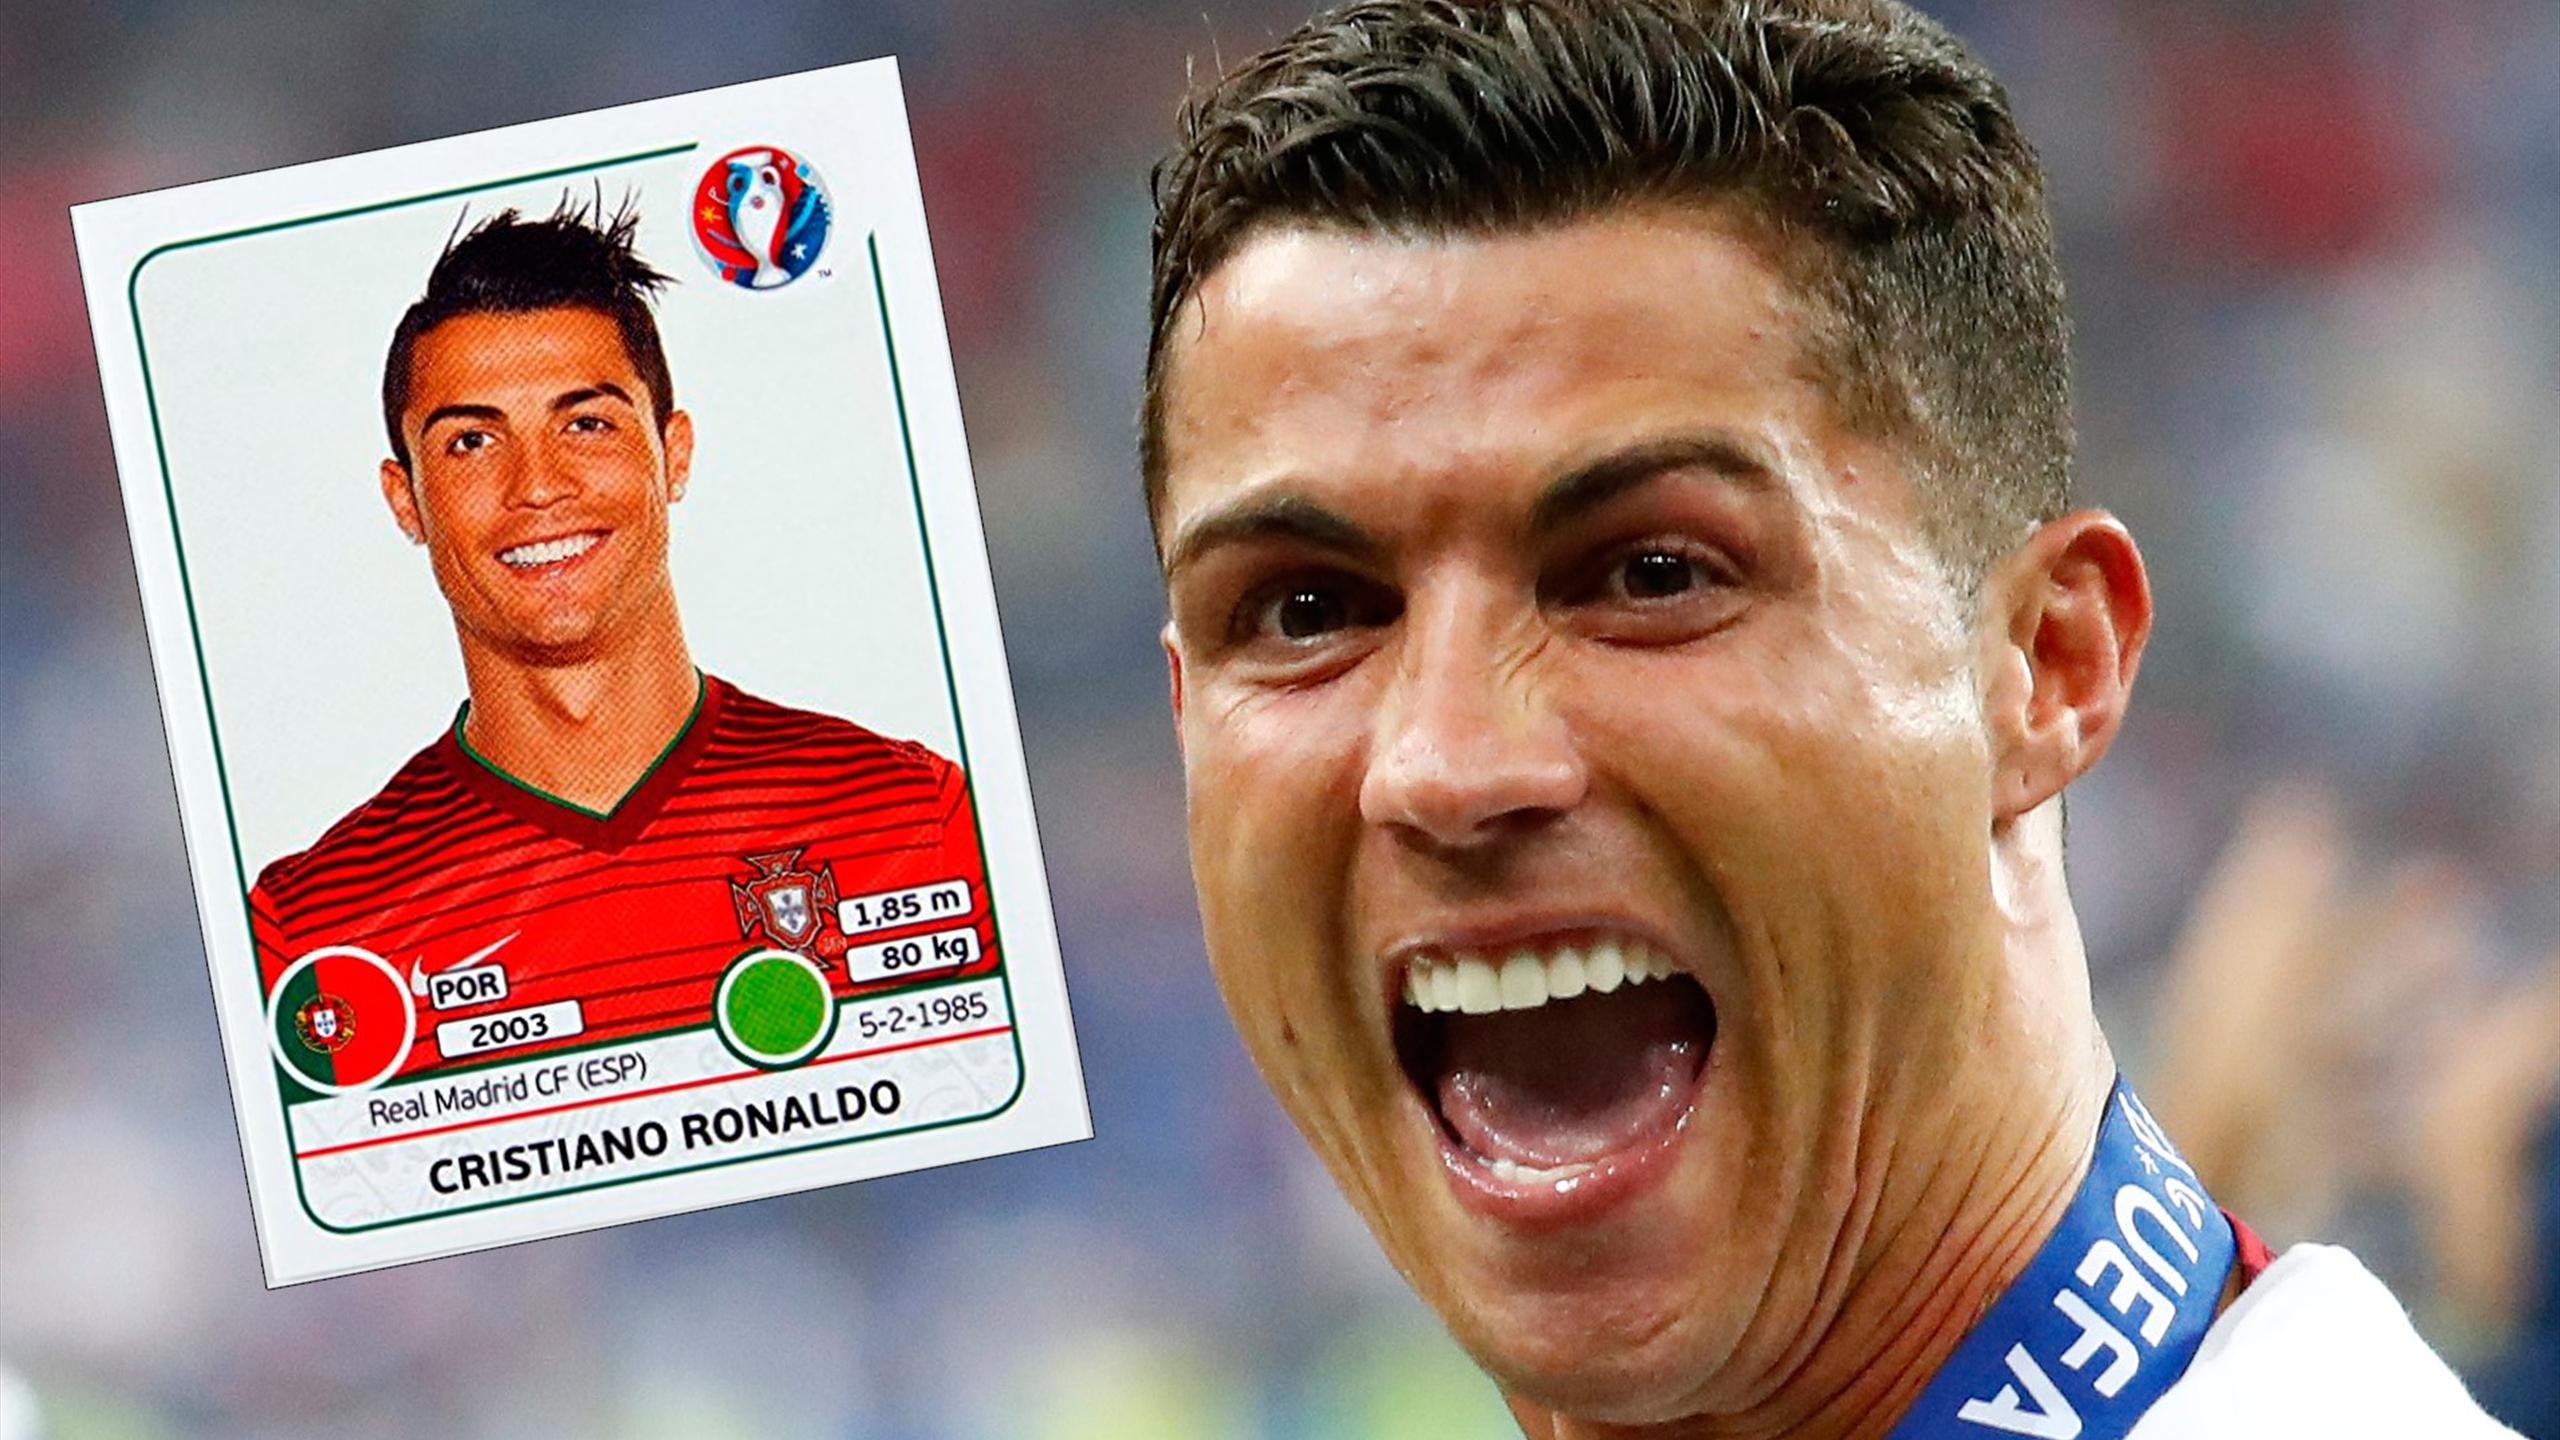 Cristiano Ronaldo and one of his Panini stickers